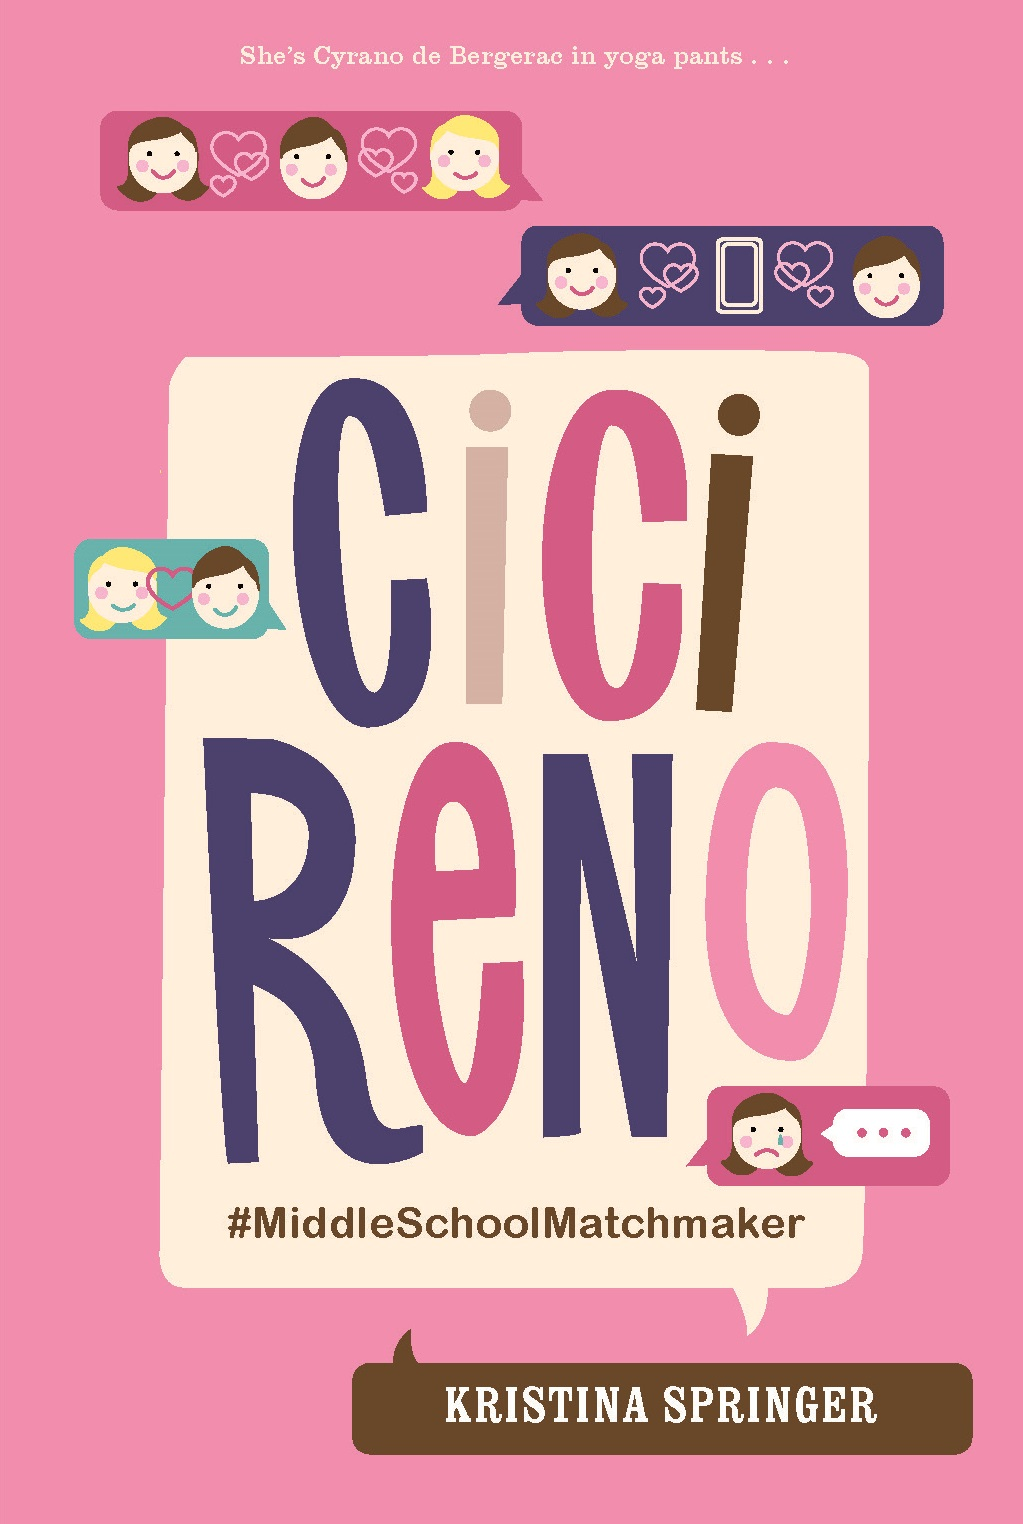 Cici Reno: #MiddleSchoolMatchmaker by Kristina Springer